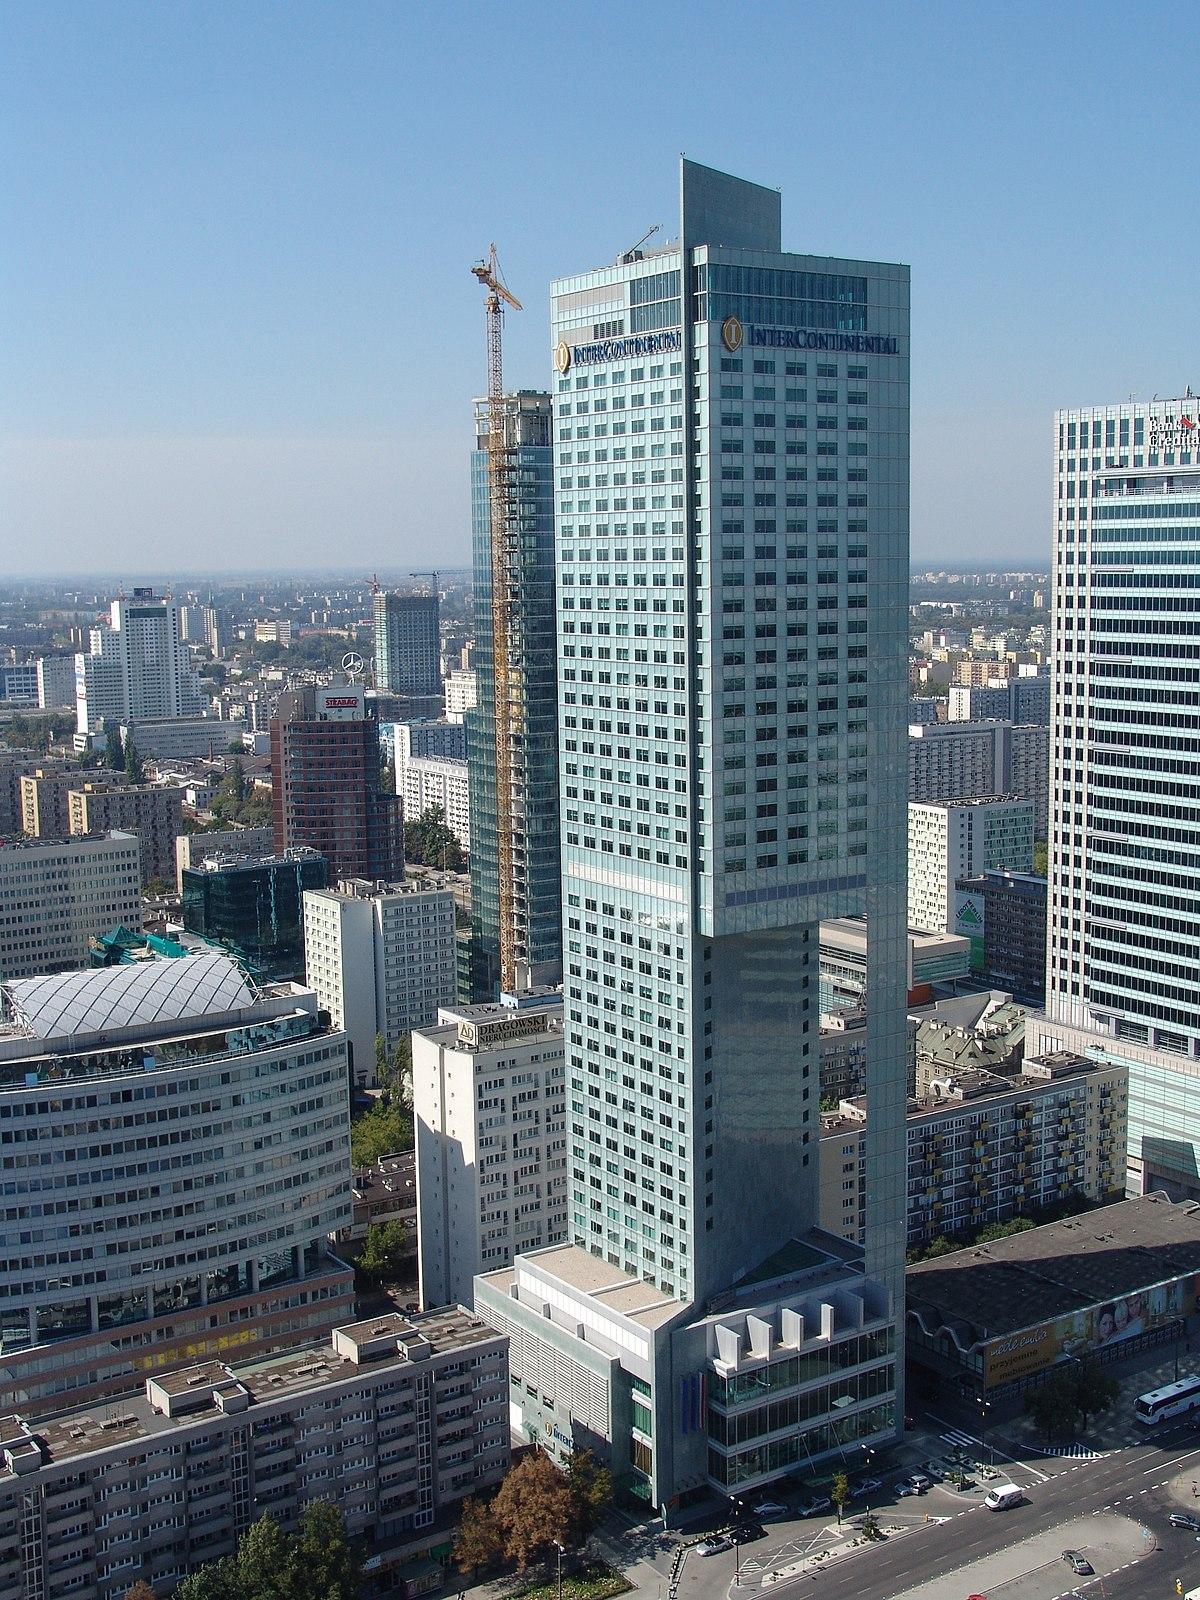 Intercontinental Warsaw Wikipedia